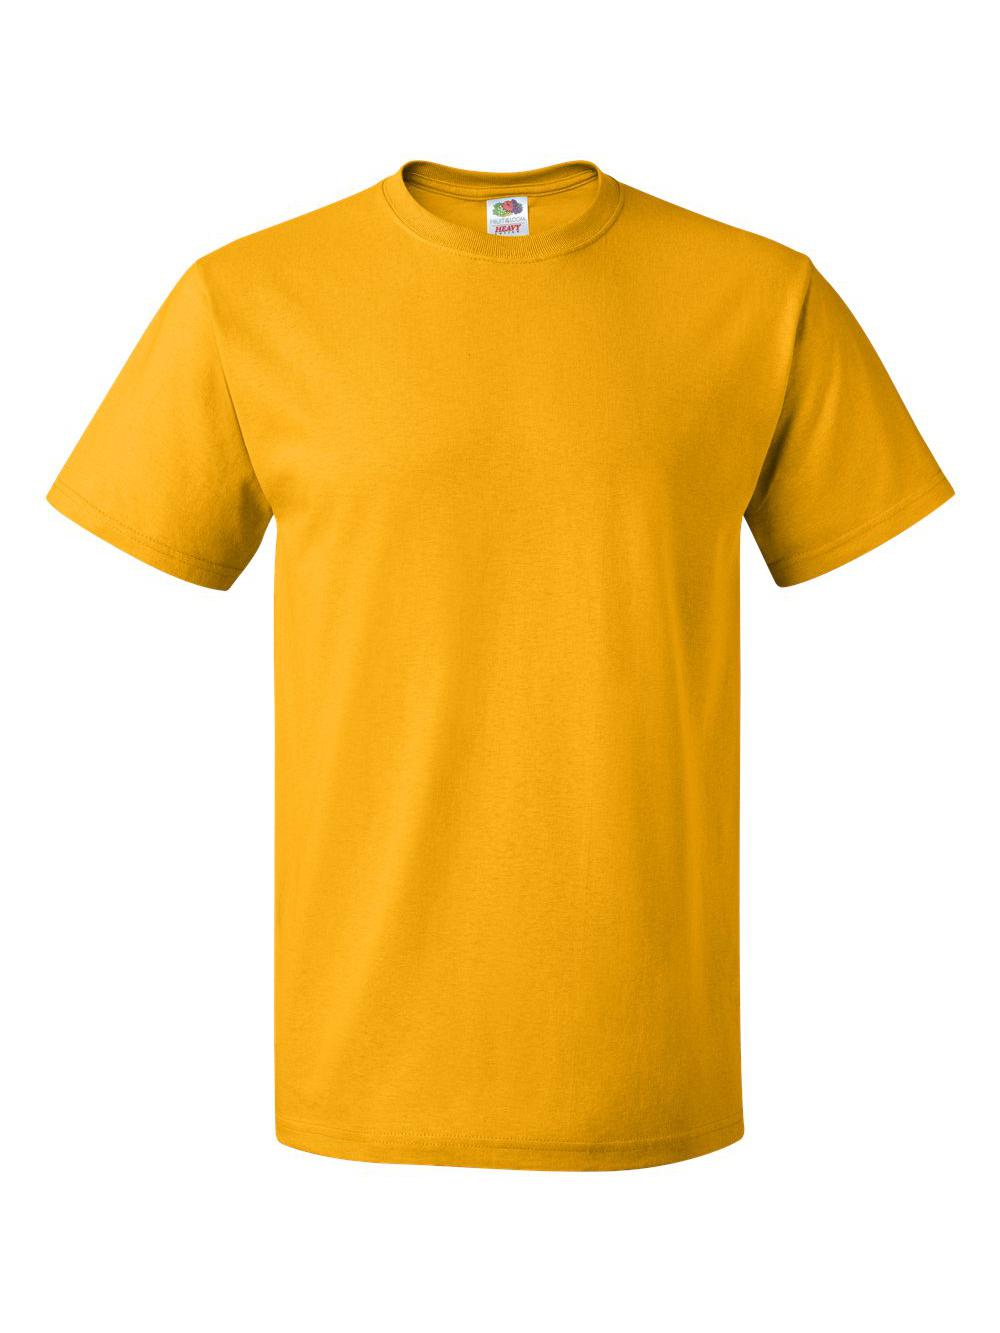 Fruit-of-the-Loom-HD-Cotton-Short-Sleeve-T-Shirt-3930R thumbnail 57